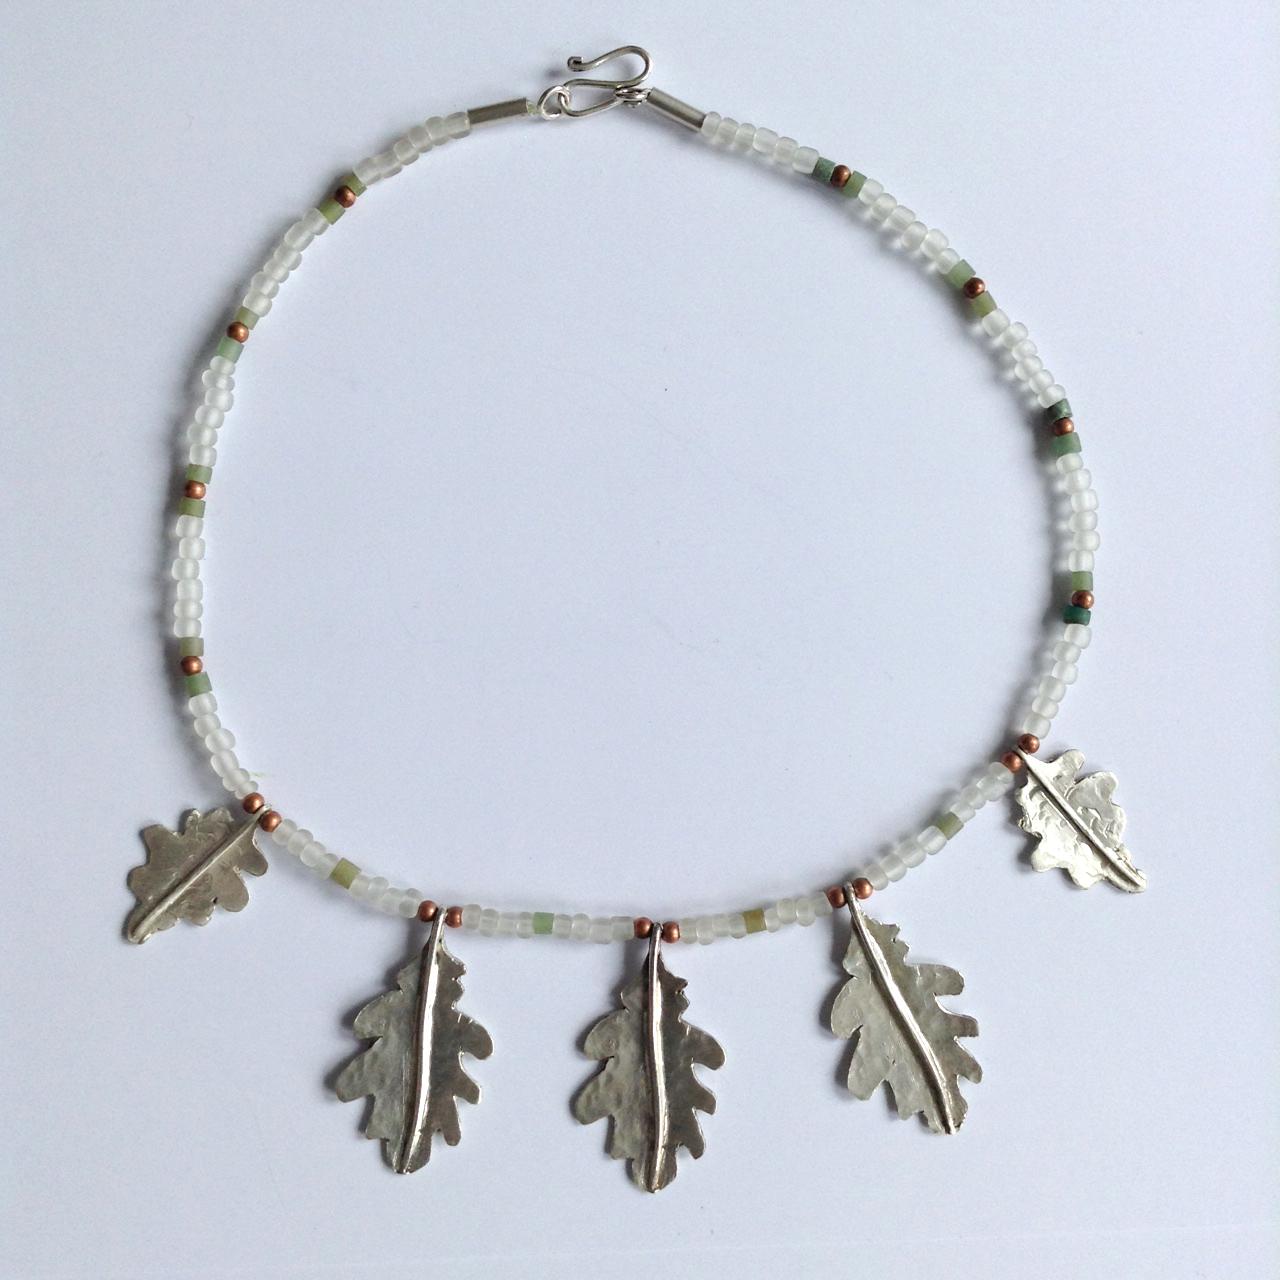 Oak Leaf Necklace Intended For Latest Oak Leaf Necklaces (Gallery 16 of 25)